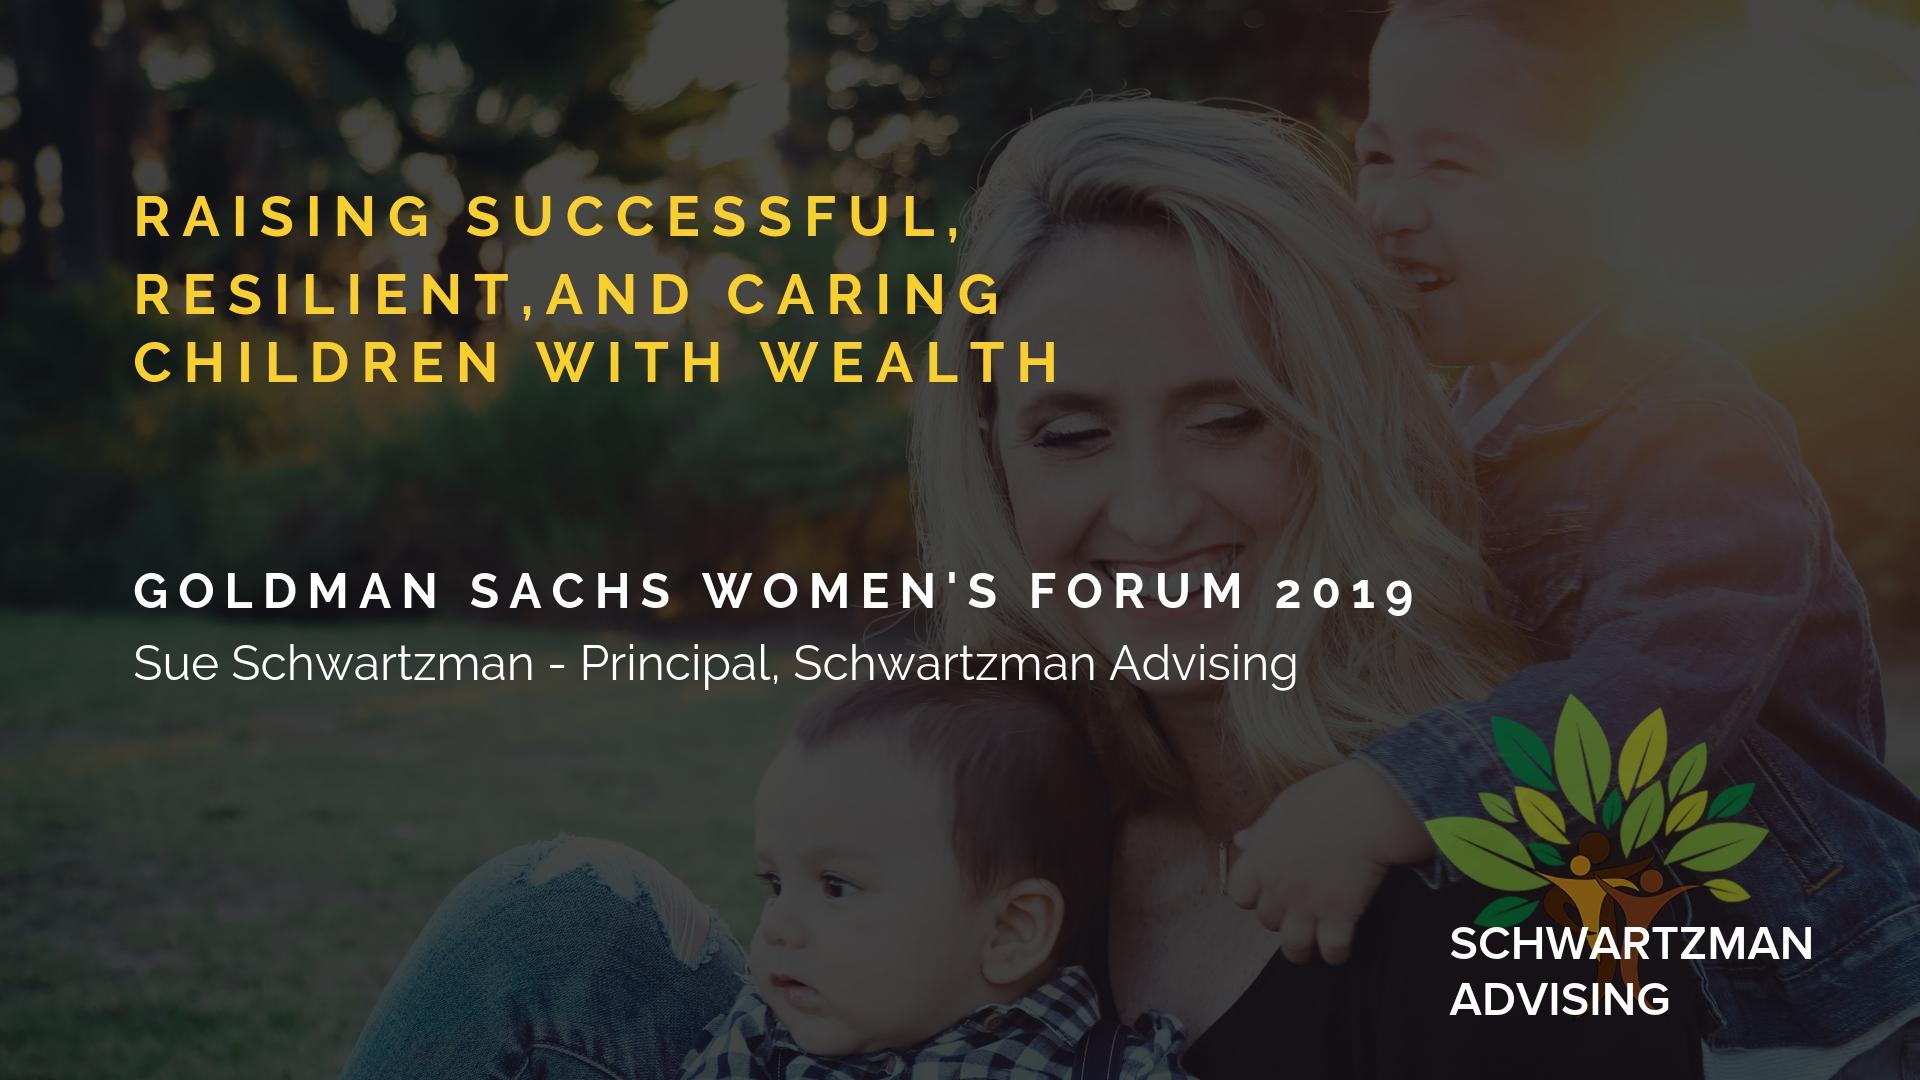 Goldman Sachs Women's Forum 2019.jpg